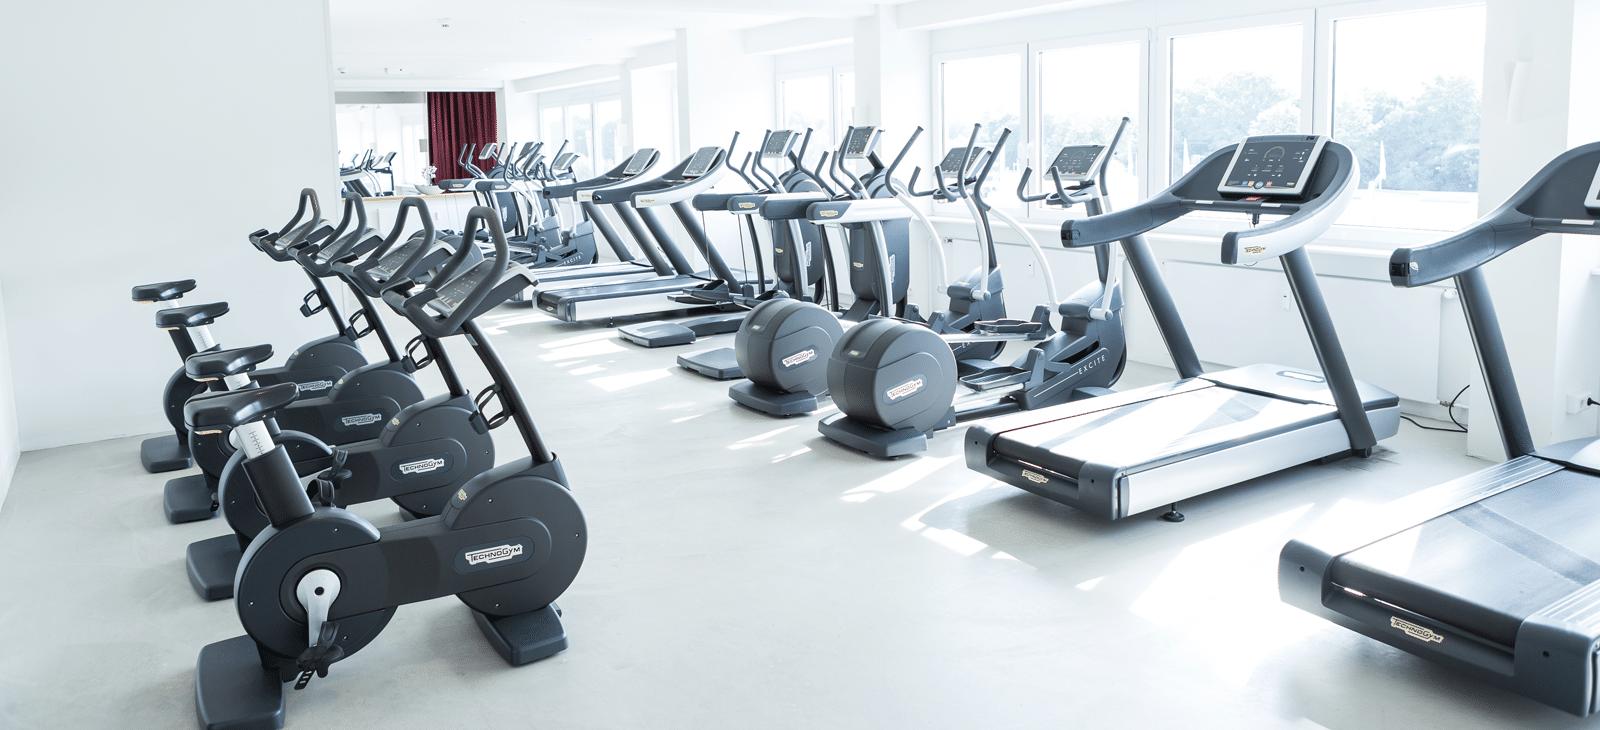 Cardio Geräte mit Ausblick im Fitness-Loft Woman Freiburg